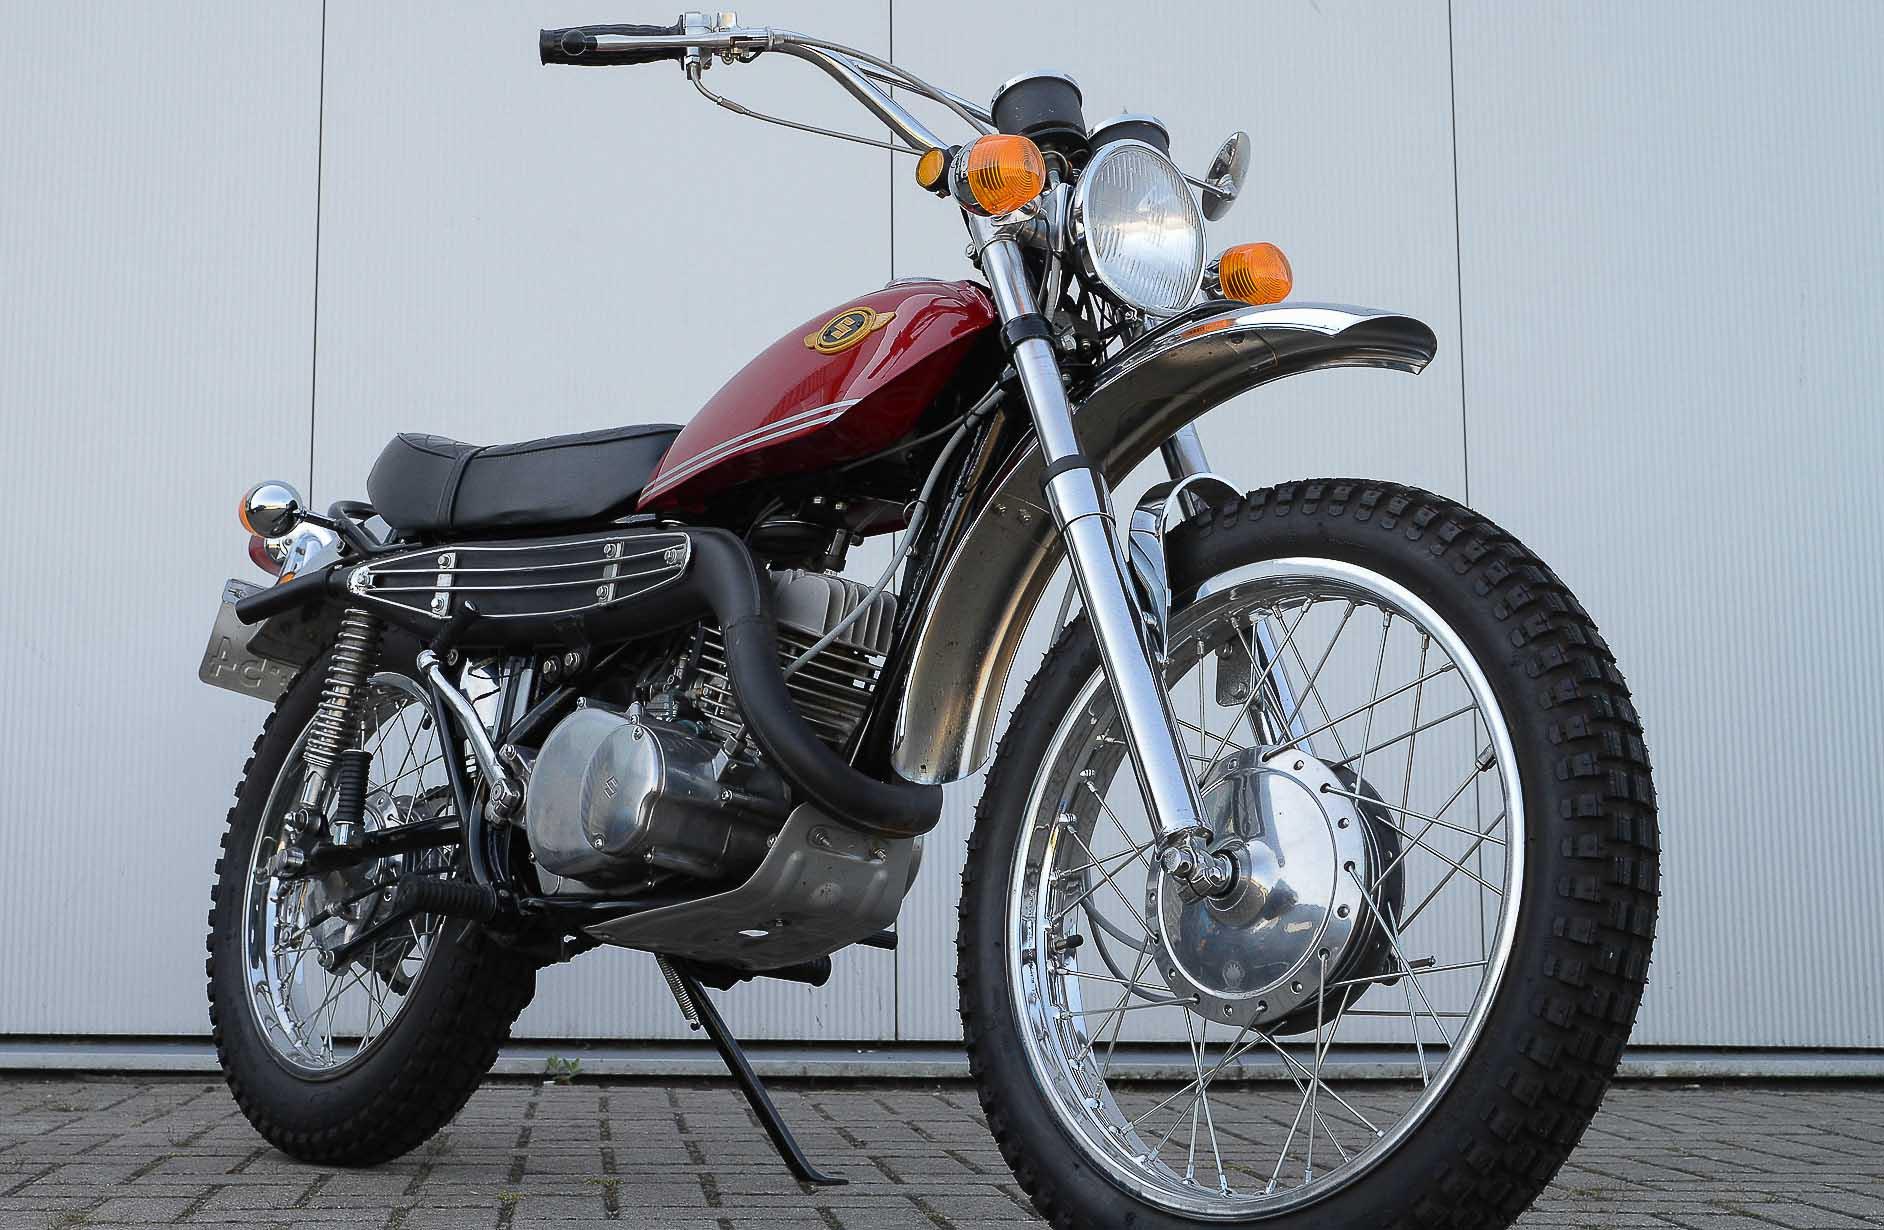 SUZUKI TS 250 (1969 - 1981)